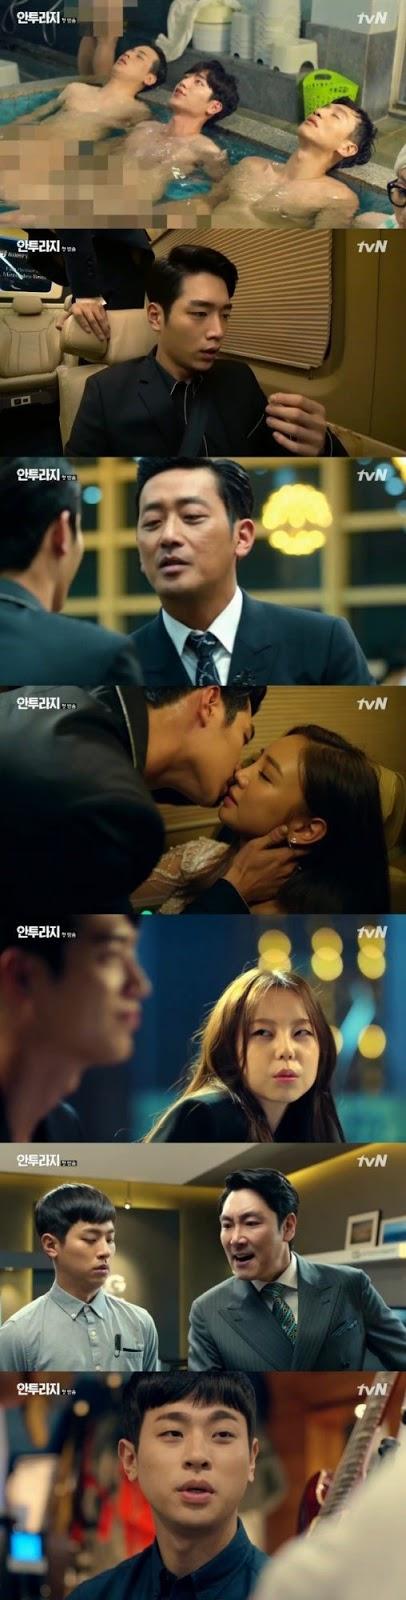 Scene-scene dari drama Entorage via soompi